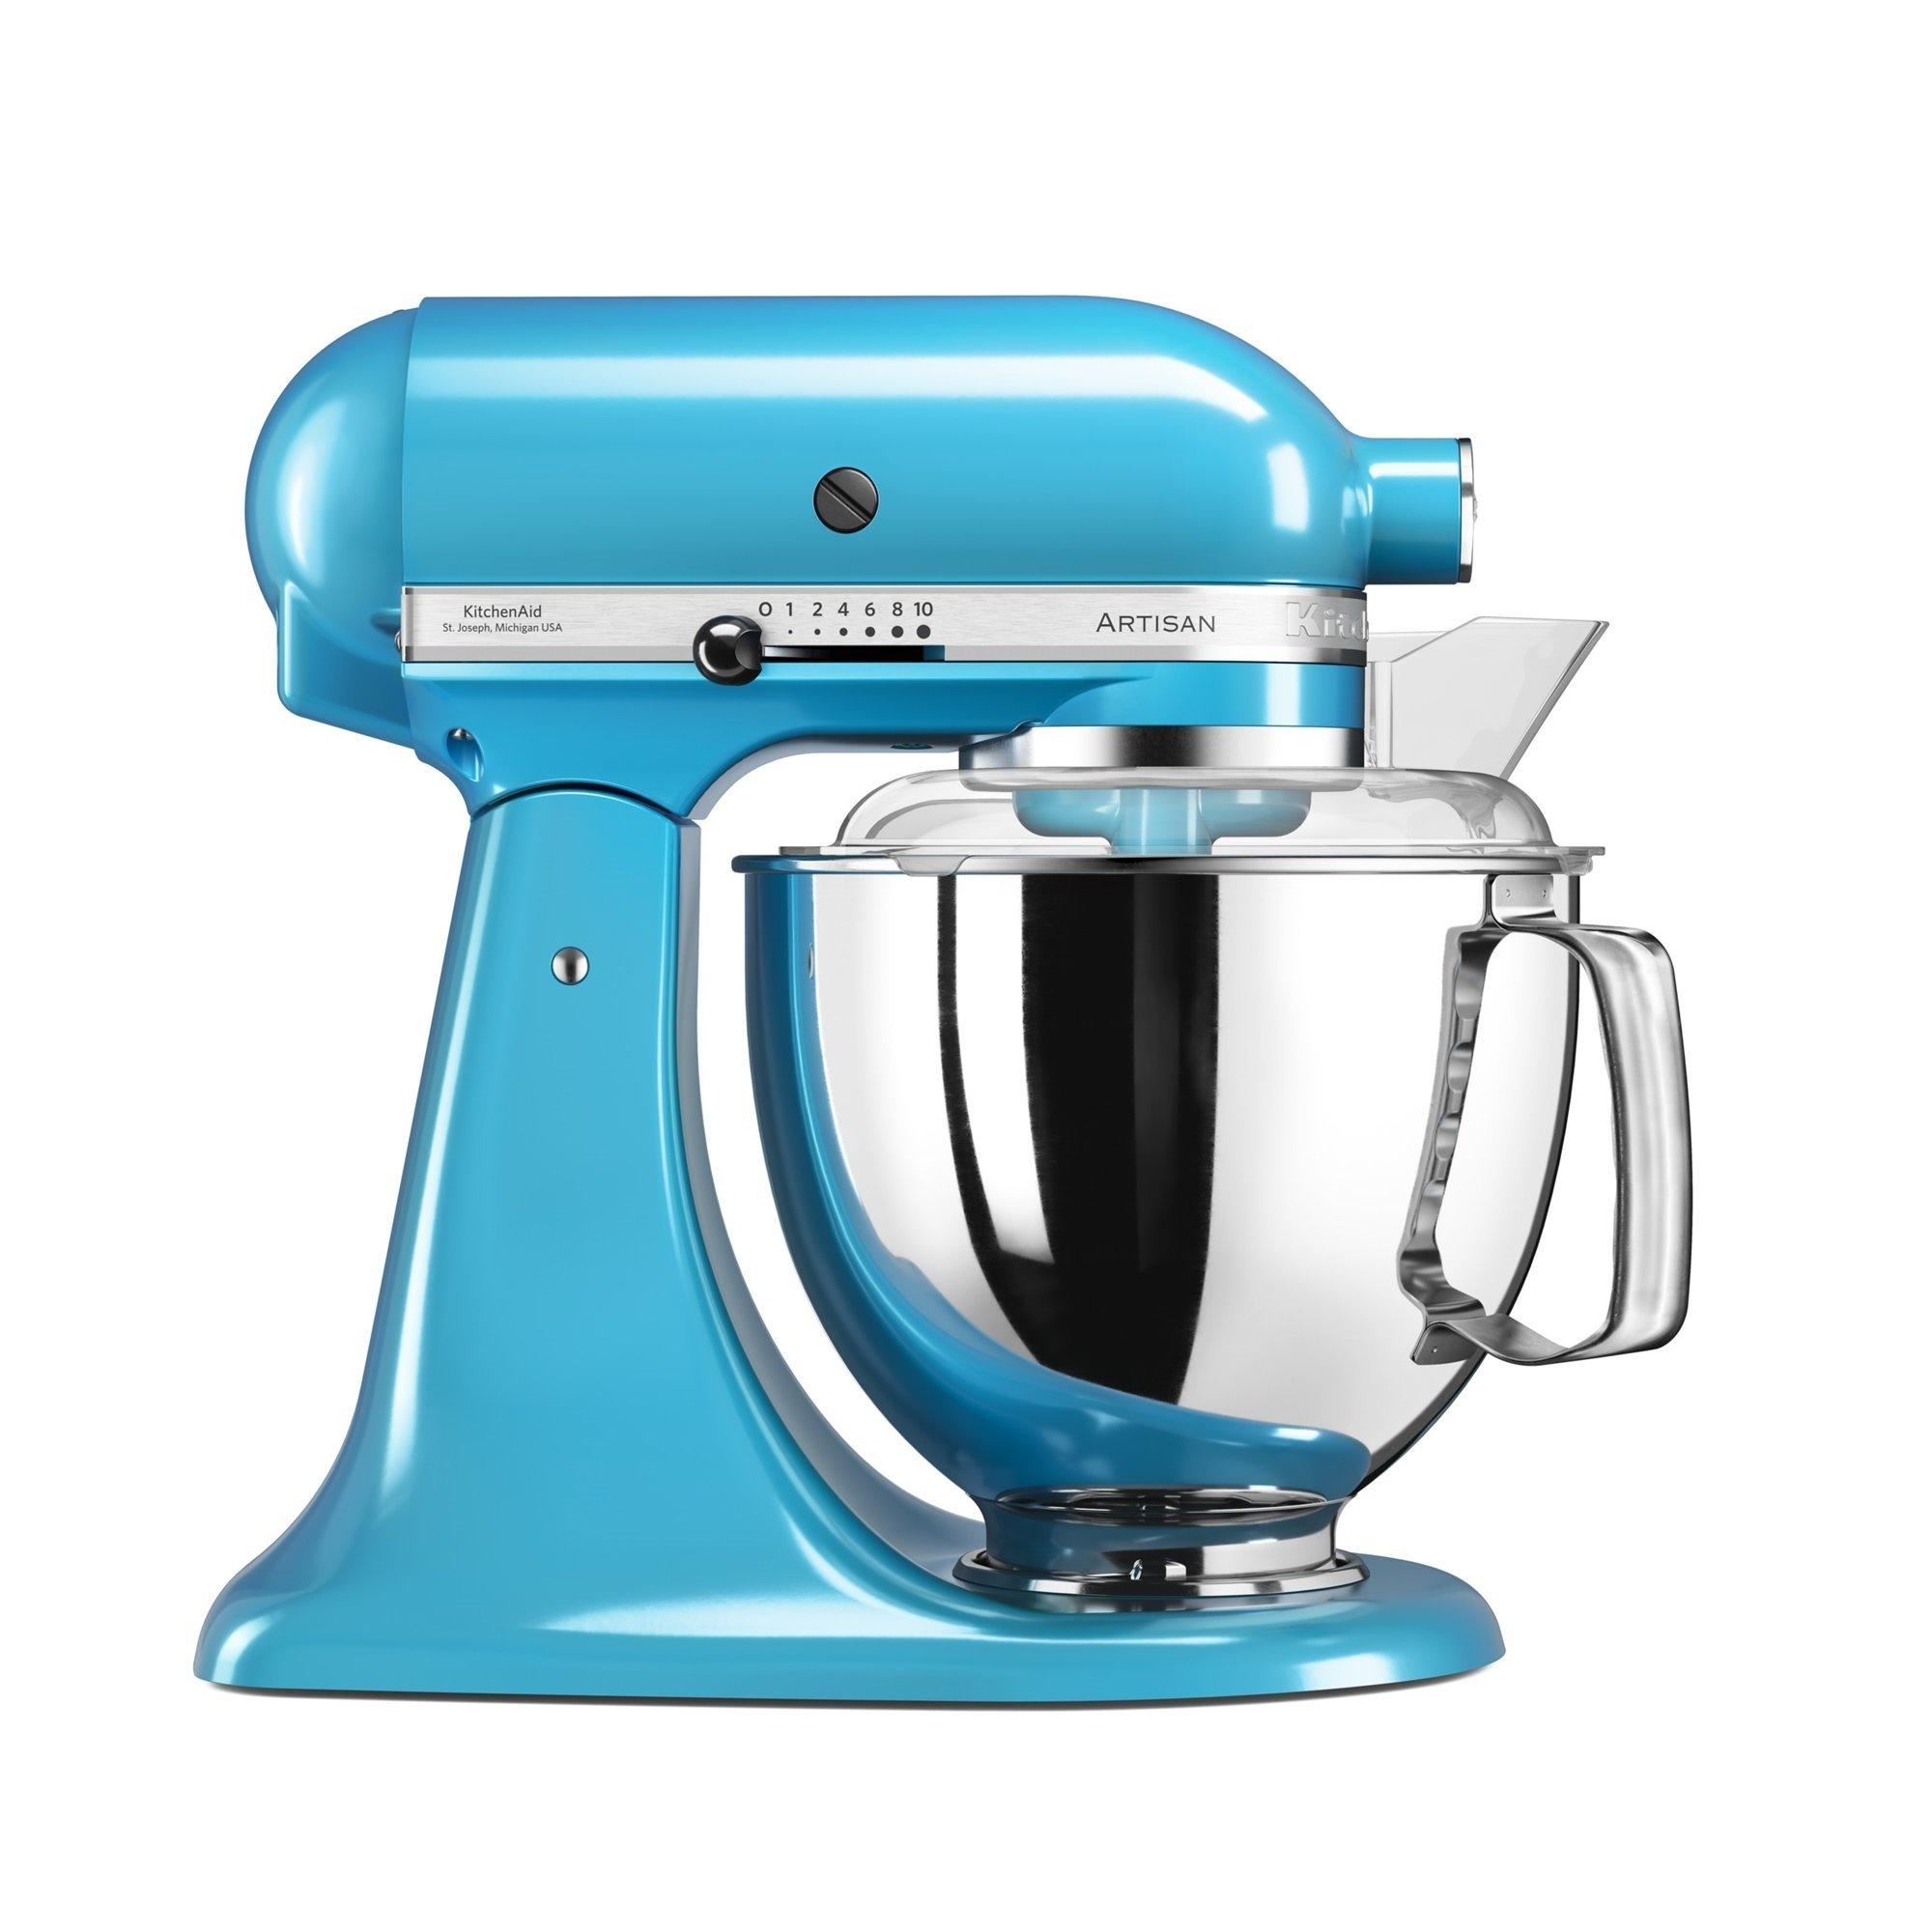 Mixer cu bol Artisan Elegance 5KSM175PSECL 48 L Crystal Blue 300W KitchenAid